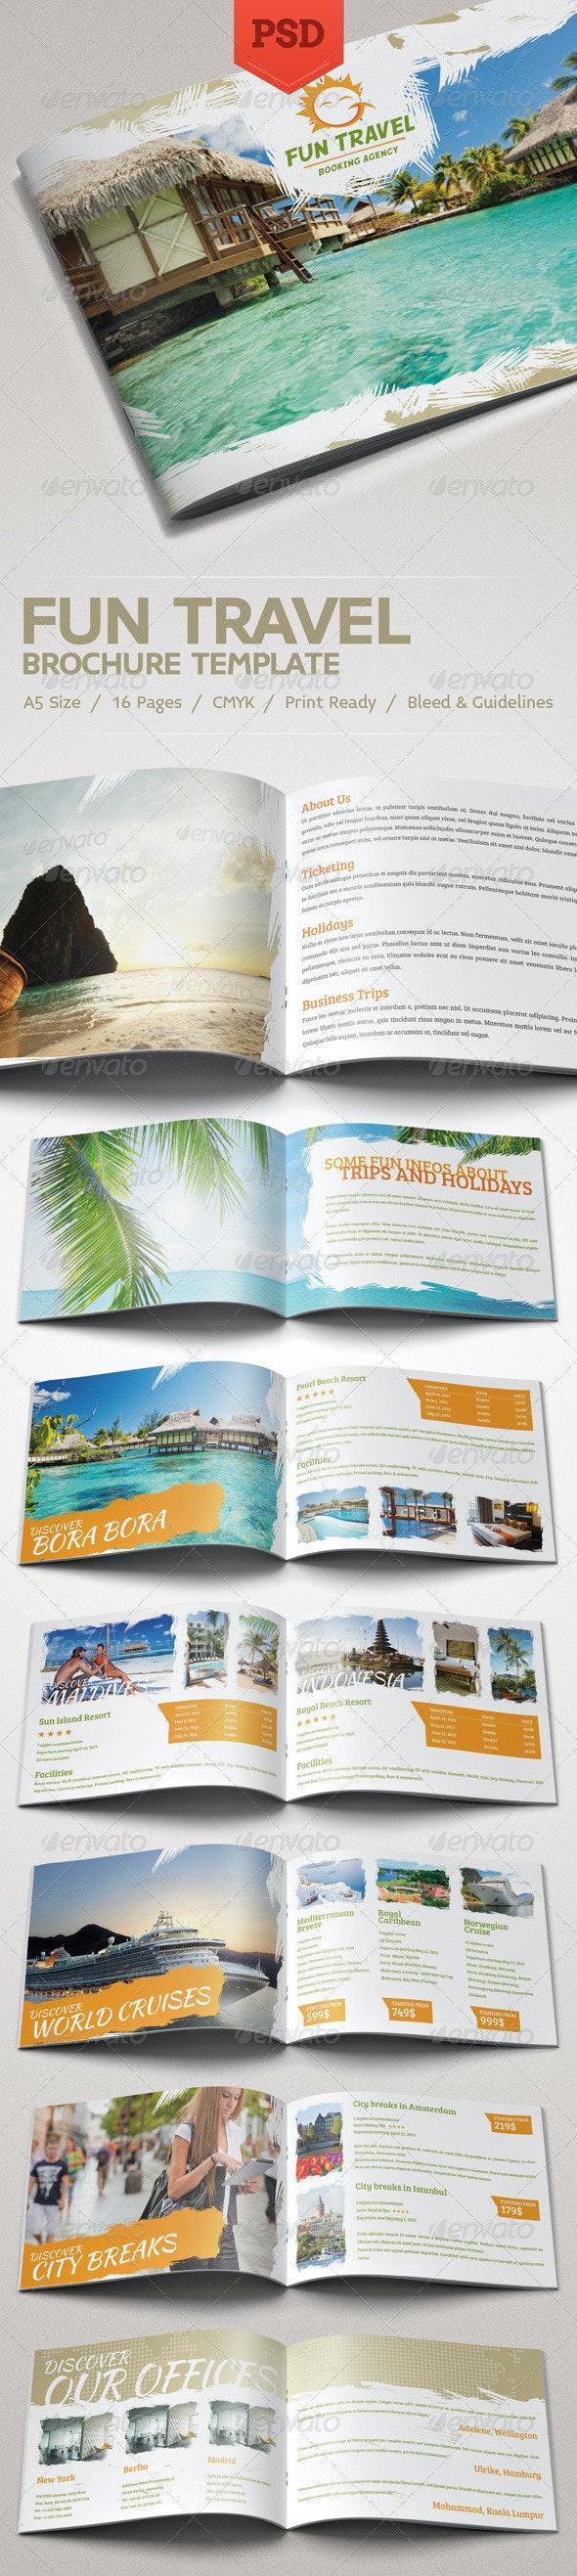 Fun Travel Brochure - Catalogs Brochures